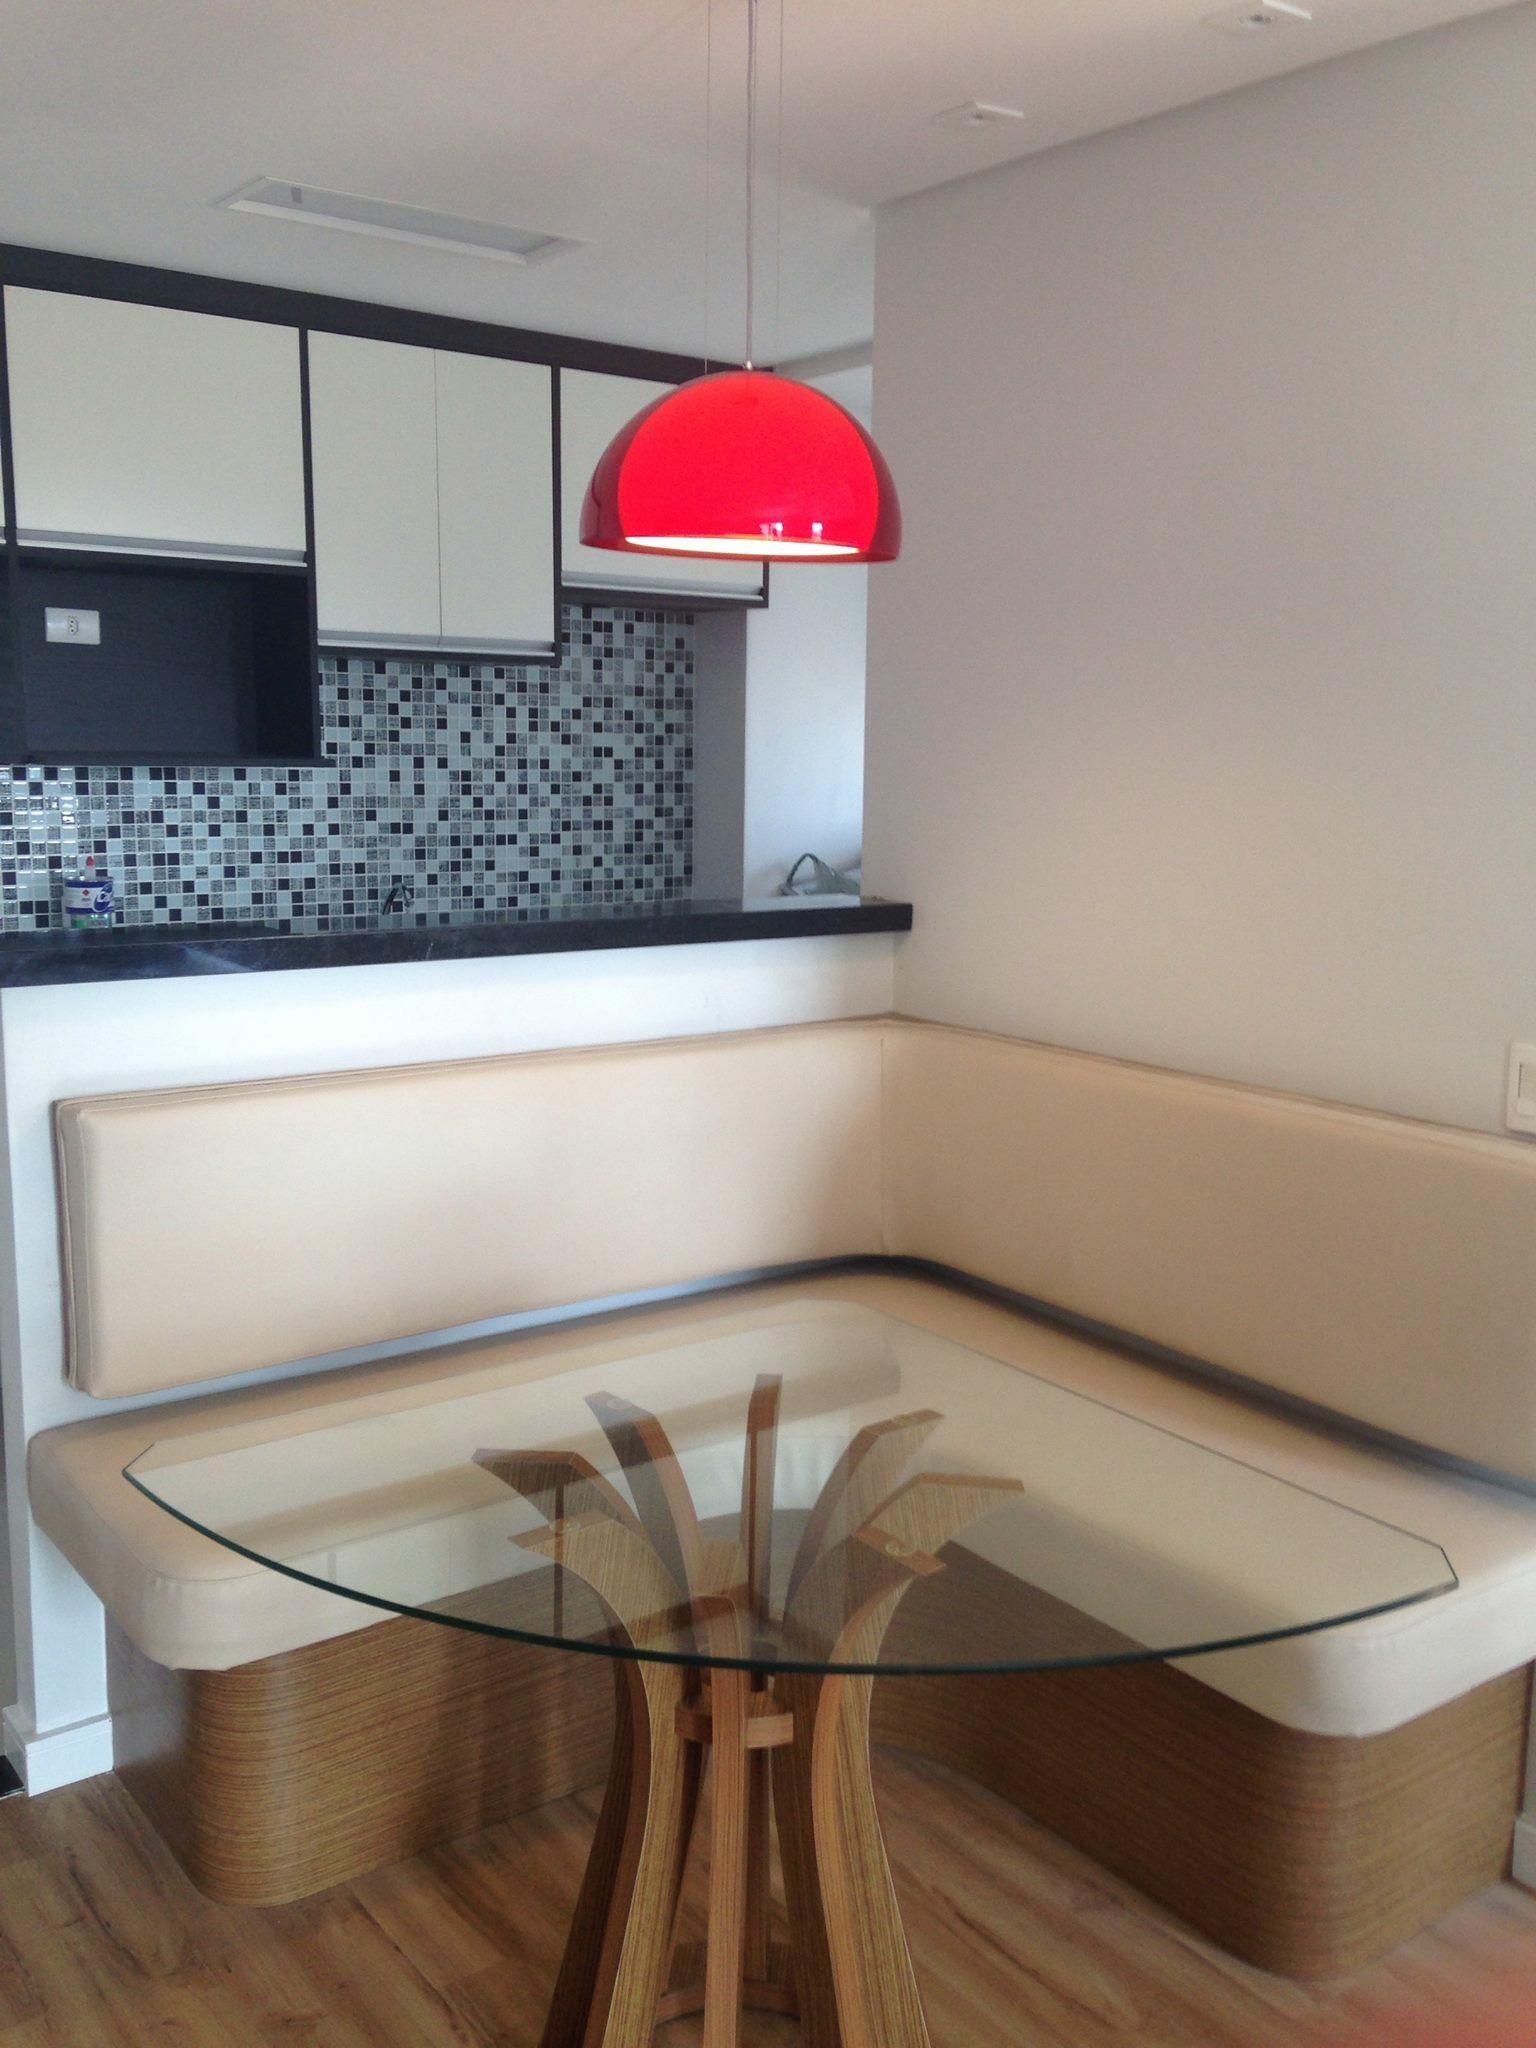 Banco Cocina Esquinero Affordable Affordable Normal With Banco  ~ Banco Esquinero Para Cocina Ikea